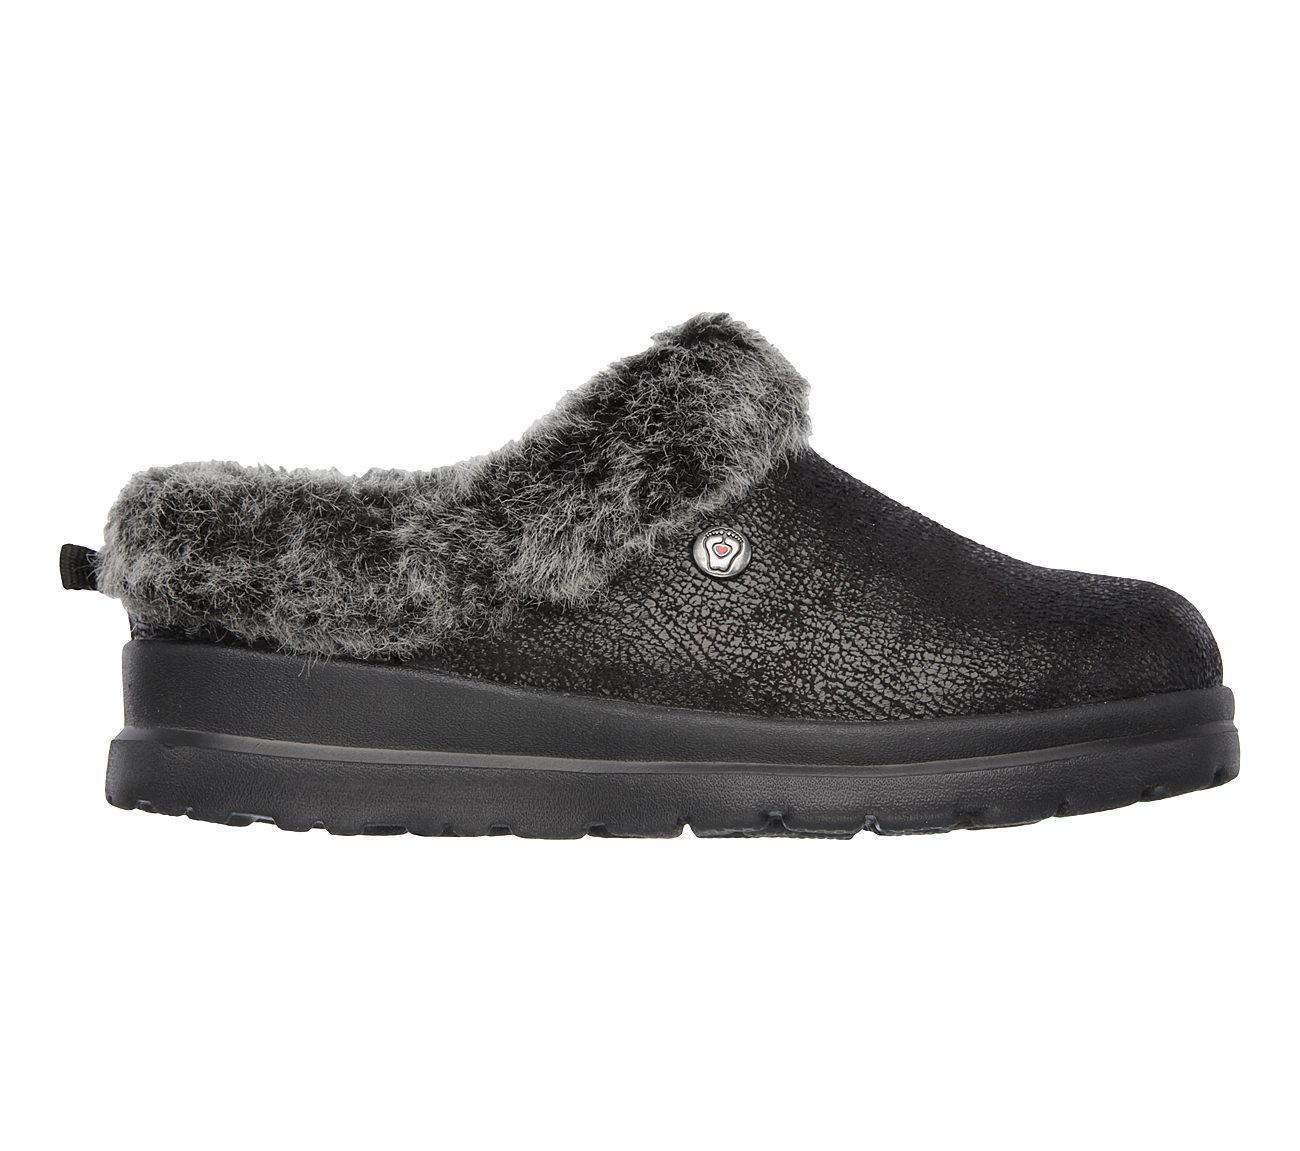 69d133deaf8e Buy SKECHERS Bobs Cherish - Snow Bunny Shoes only  50.00